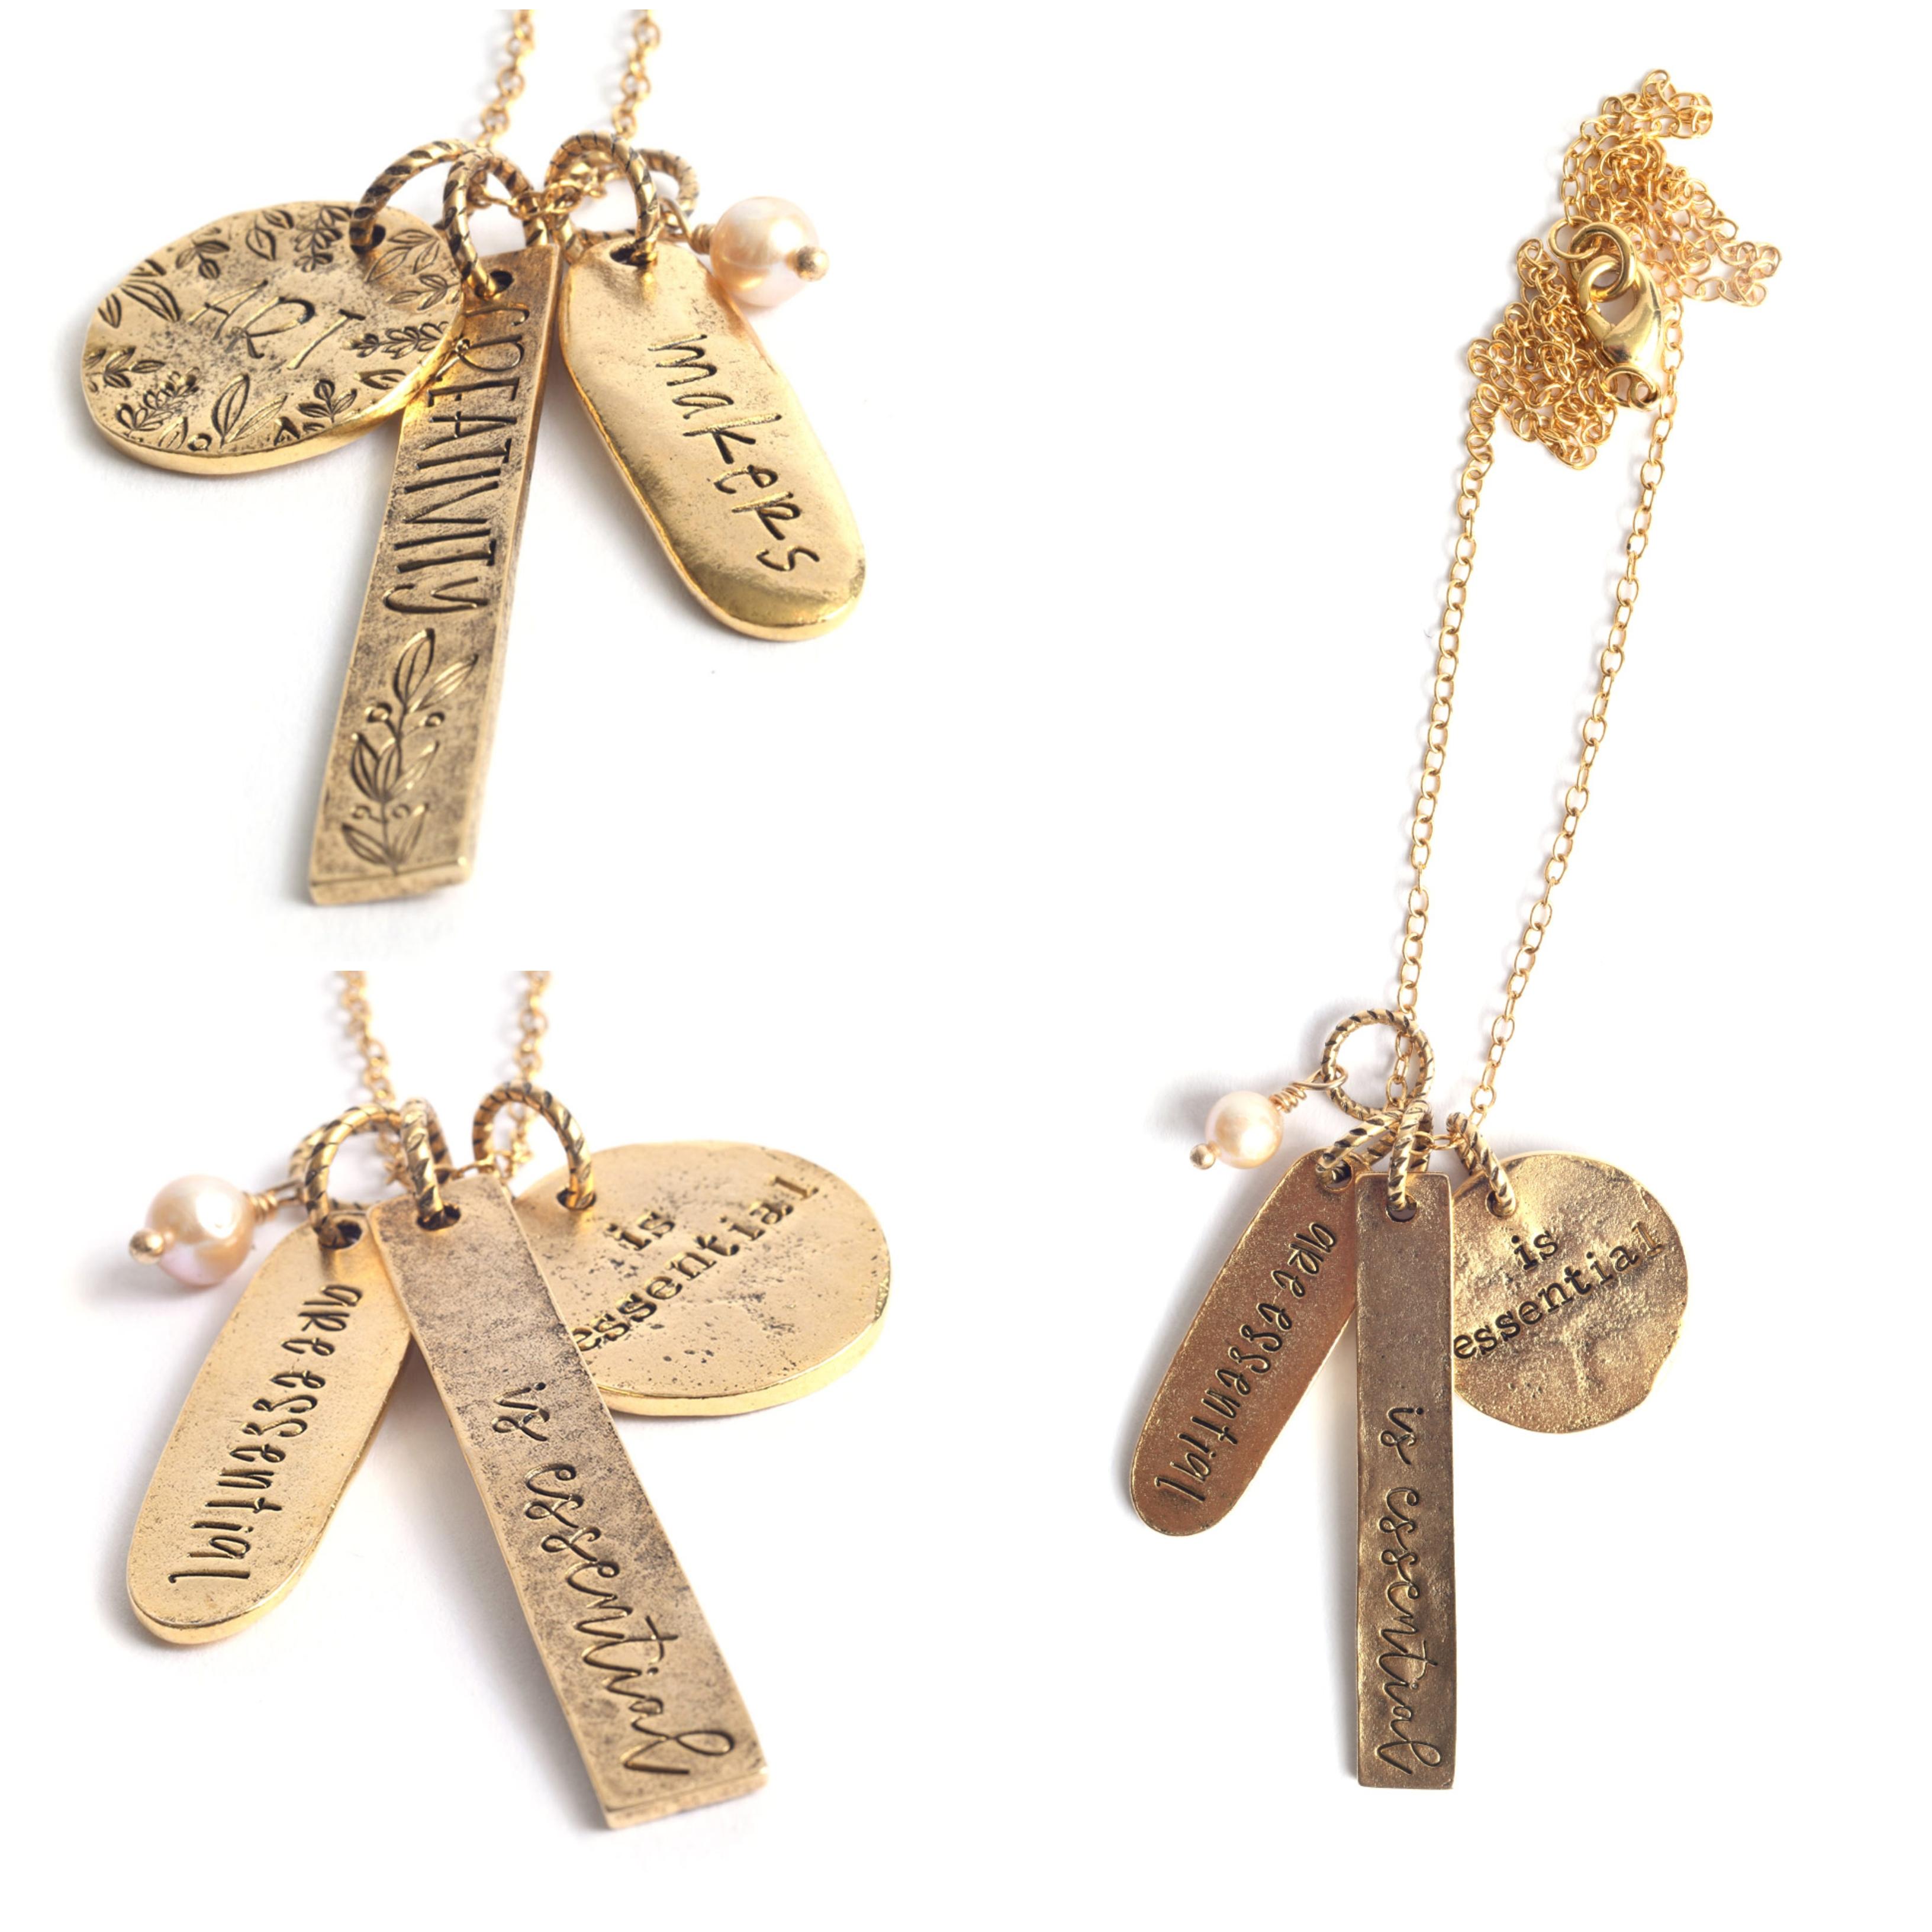 Nunn Design Essential Tags Jewelry